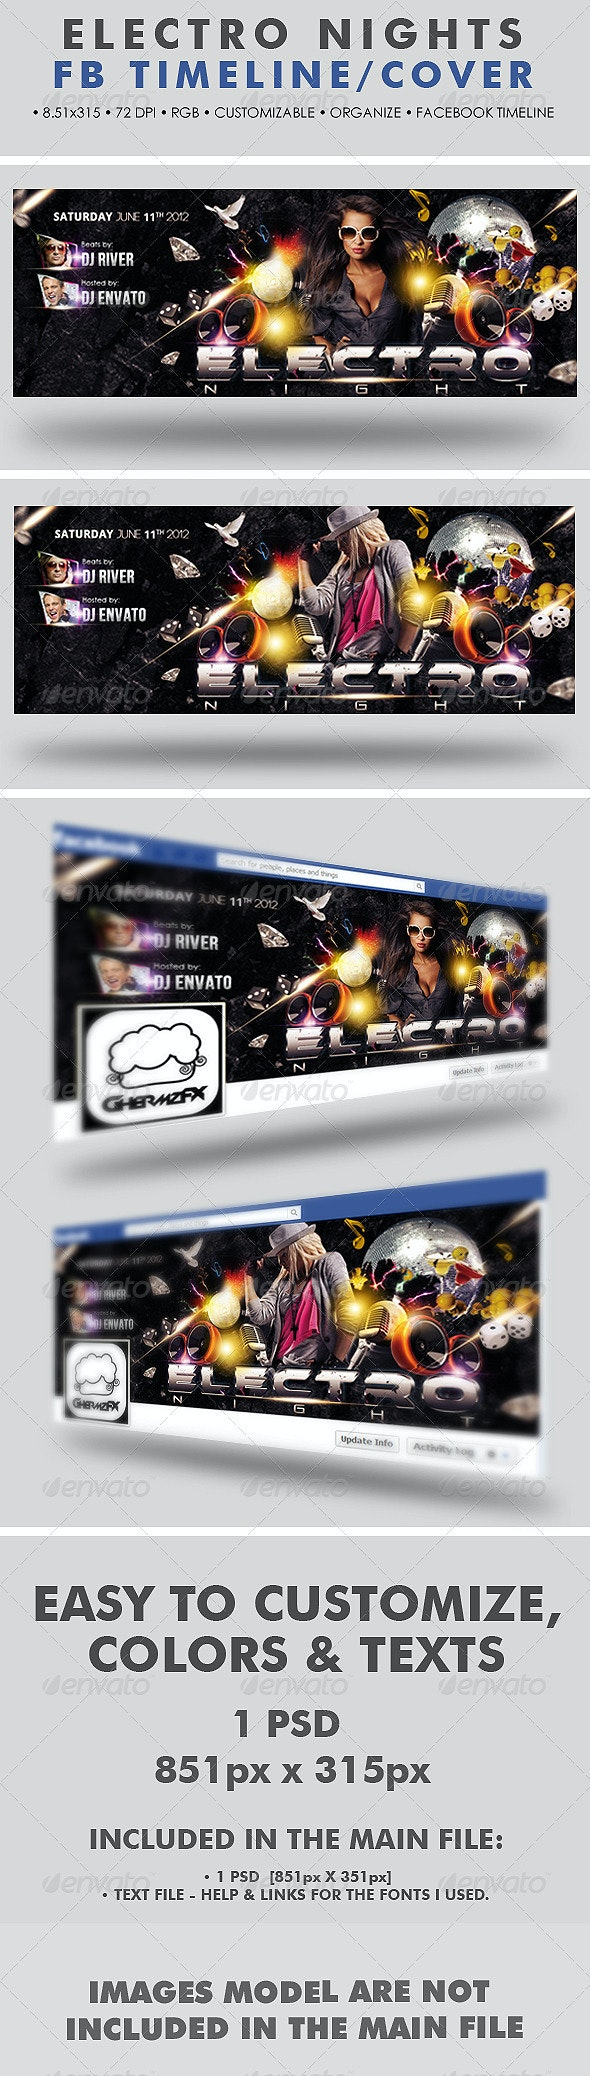 Electro Nights Facebook Timeline Cover - Facebook Timeline Covers Social Media